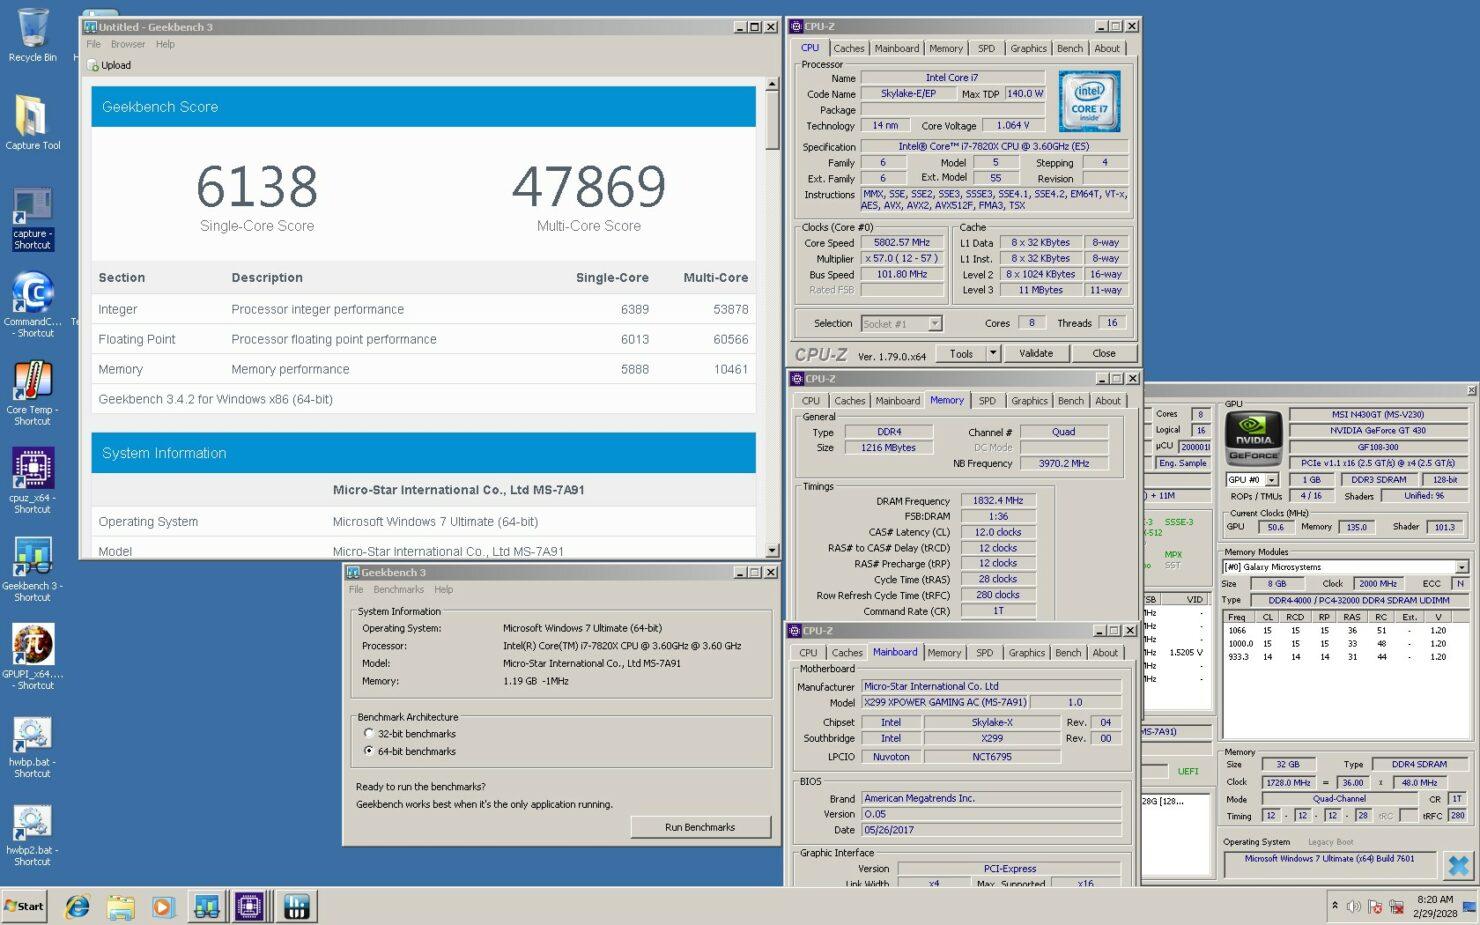 intel-core-i7-7820x-ln2-overclock_geekbench-3